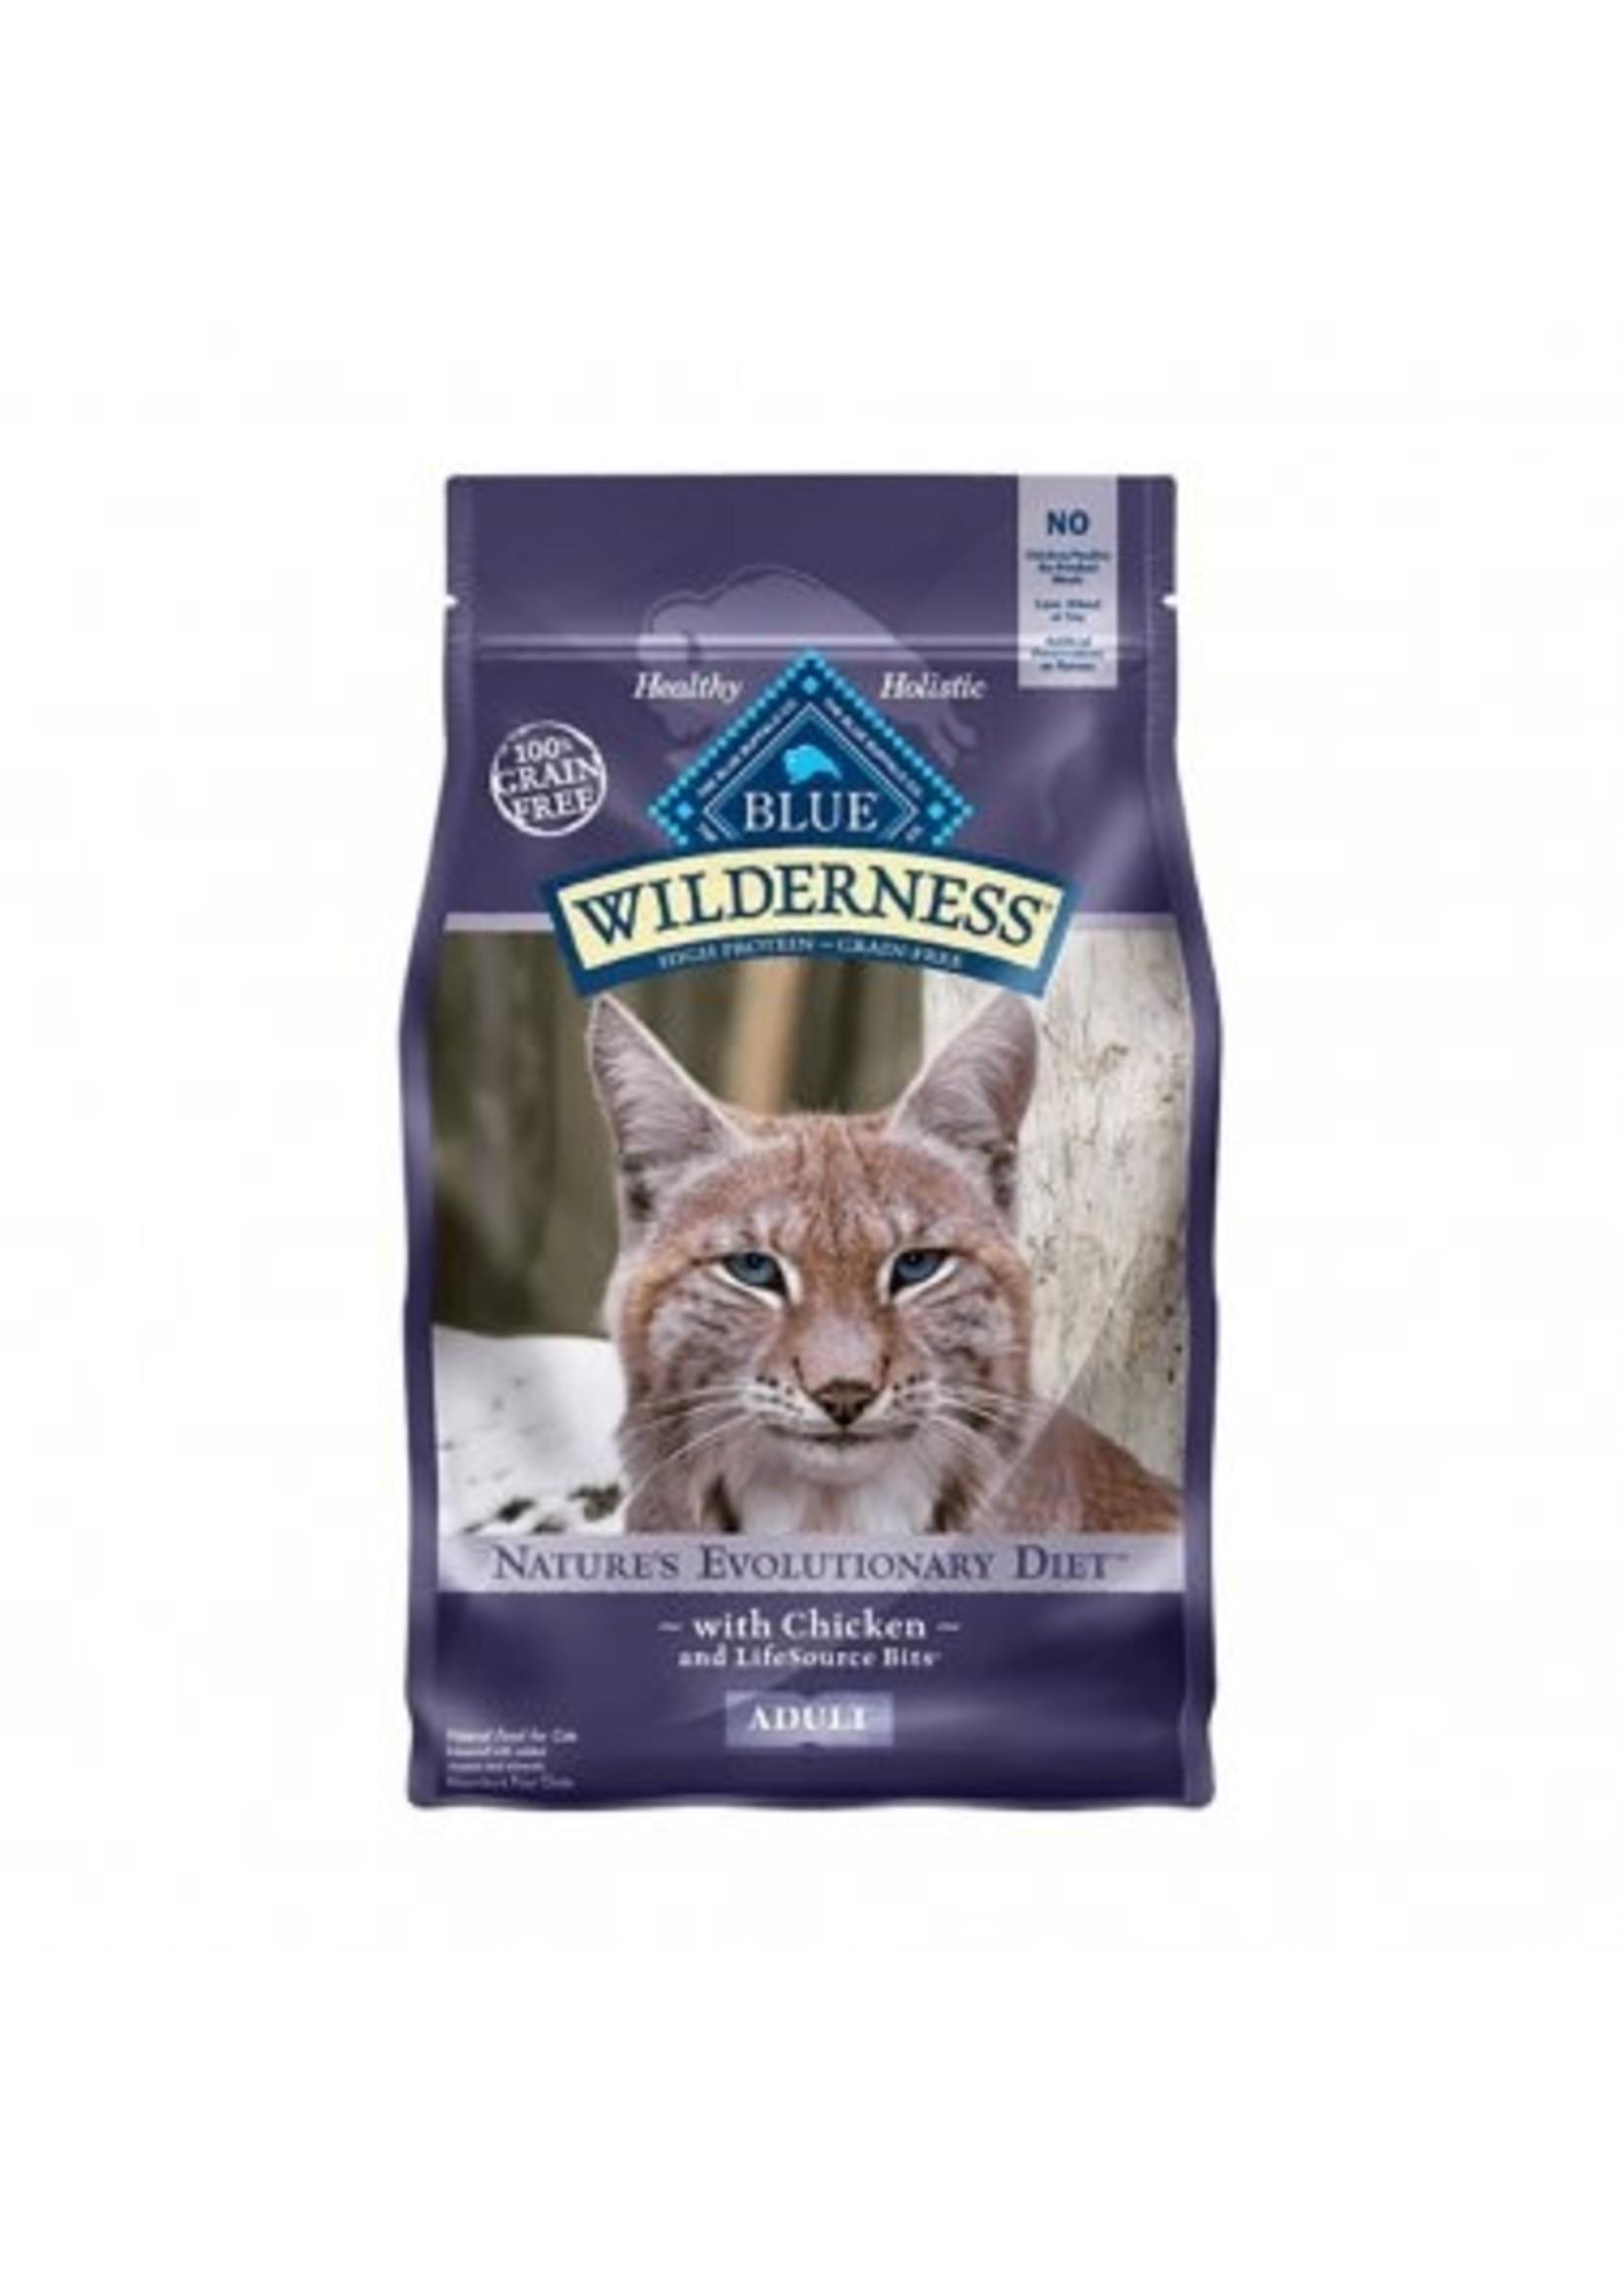 Blue Buffalo Blue Wilderness™ Nature's Evolutionary Diet Grain Free Chicken Adult Cat Food 12 Lbs